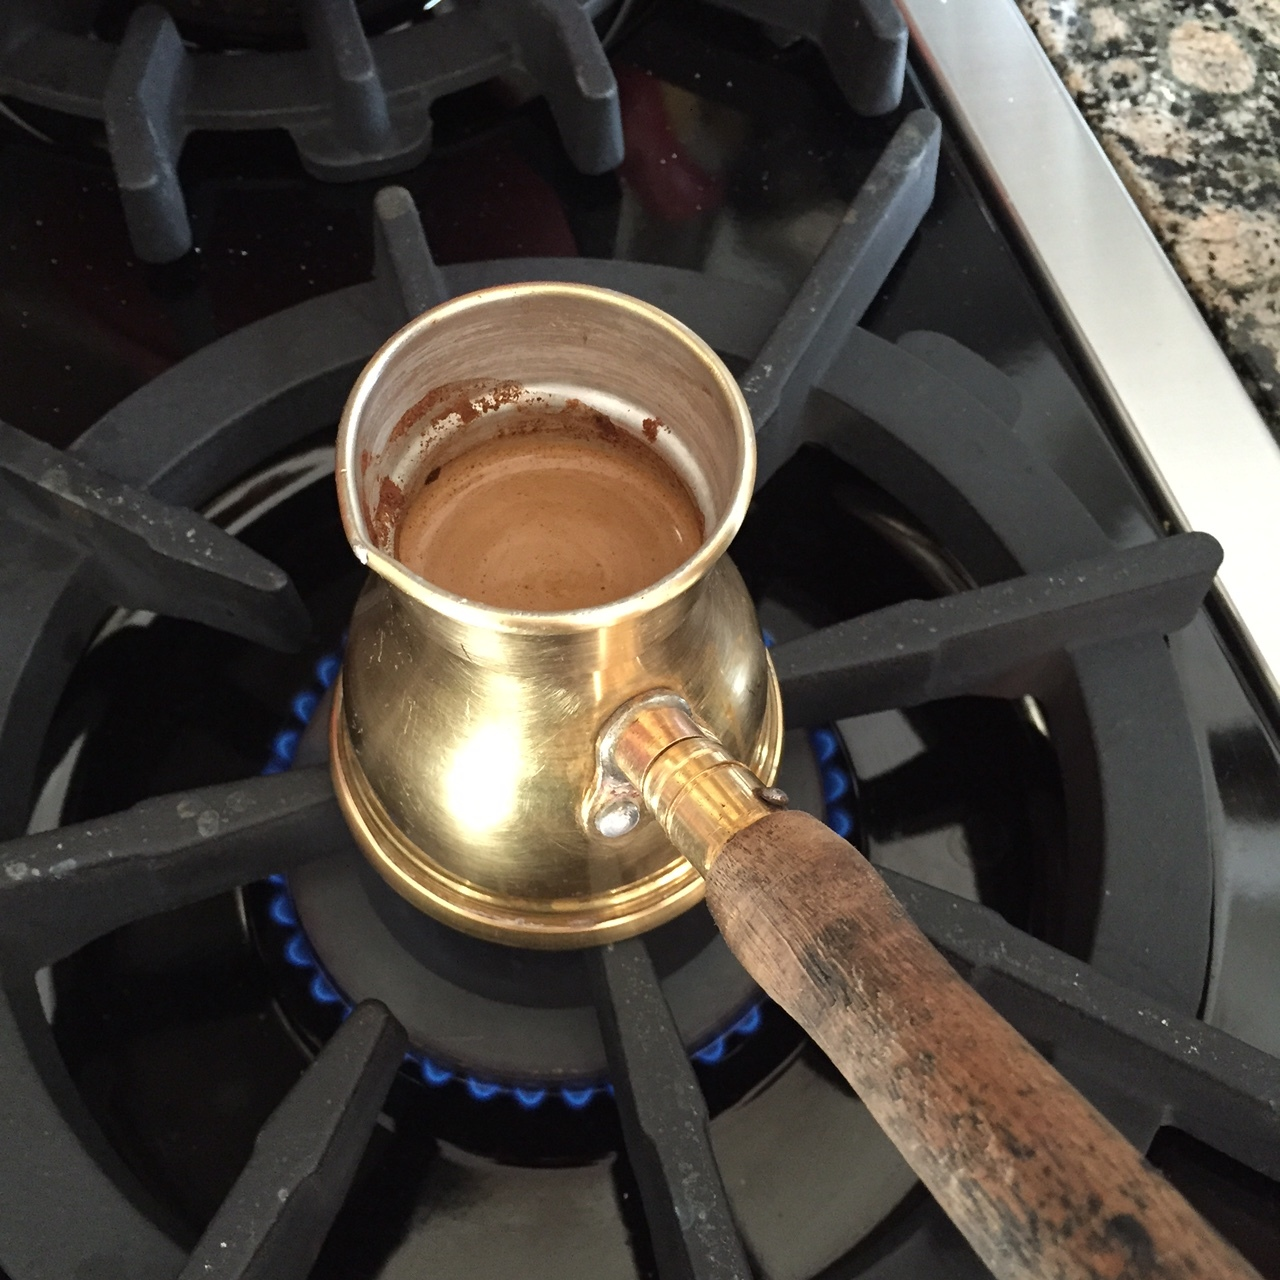 Dessert always comes with Turkish Coffee